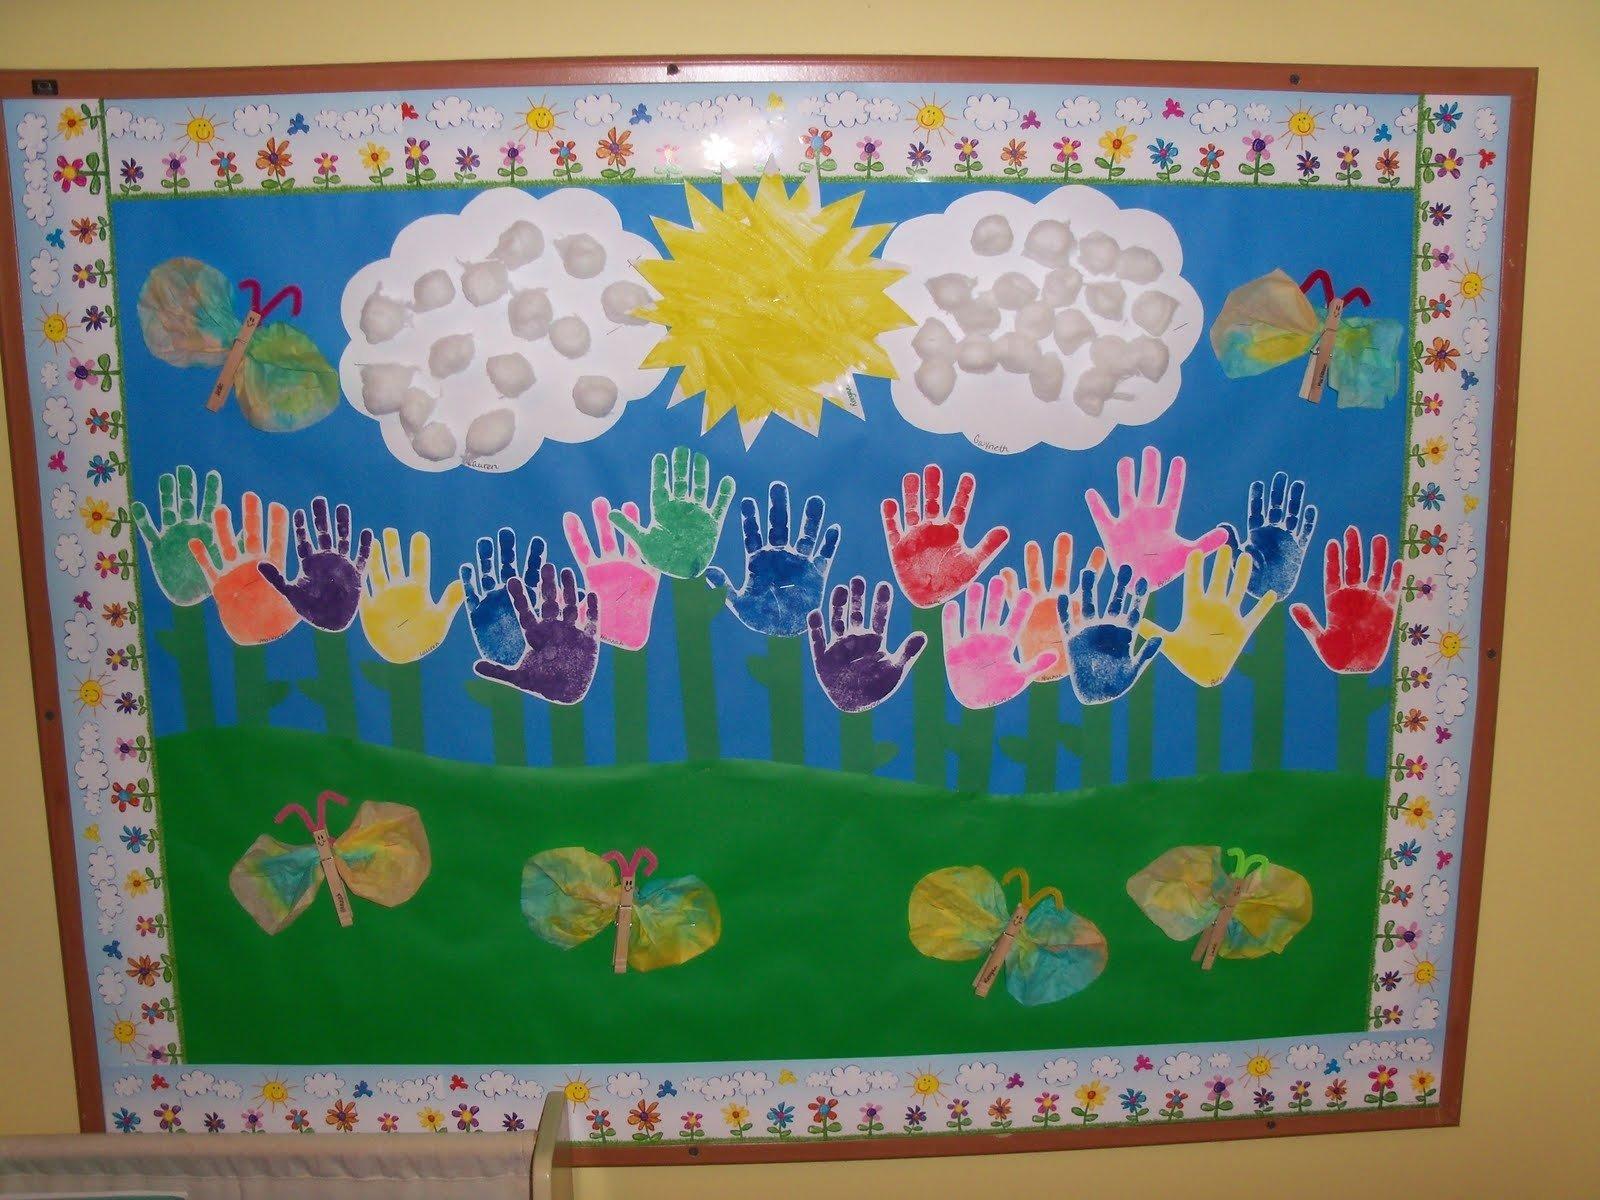 10 Trendy Spring Preschool Bulletin Board Ideas spring craft ideas the thoughtful spot day care spring fun 1 2020